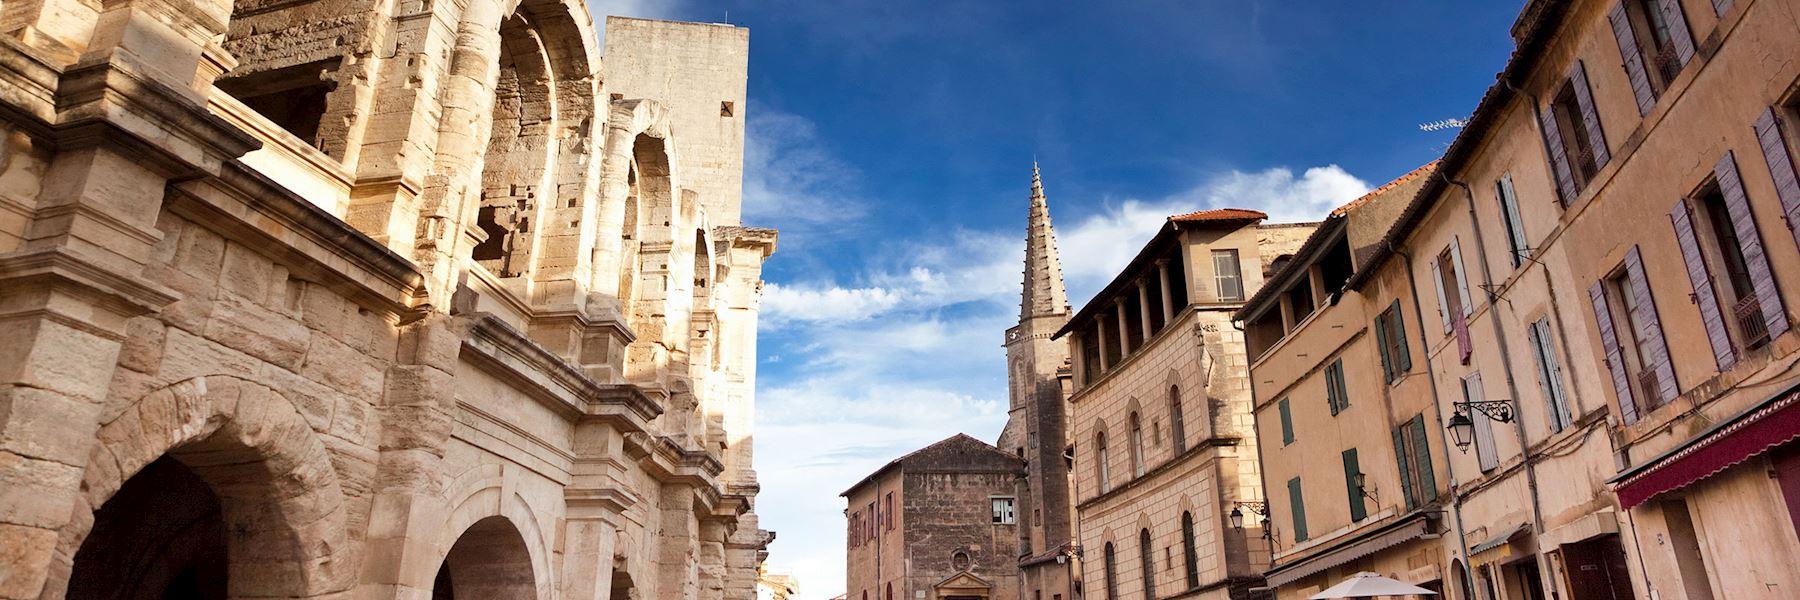 Visit Arles, France